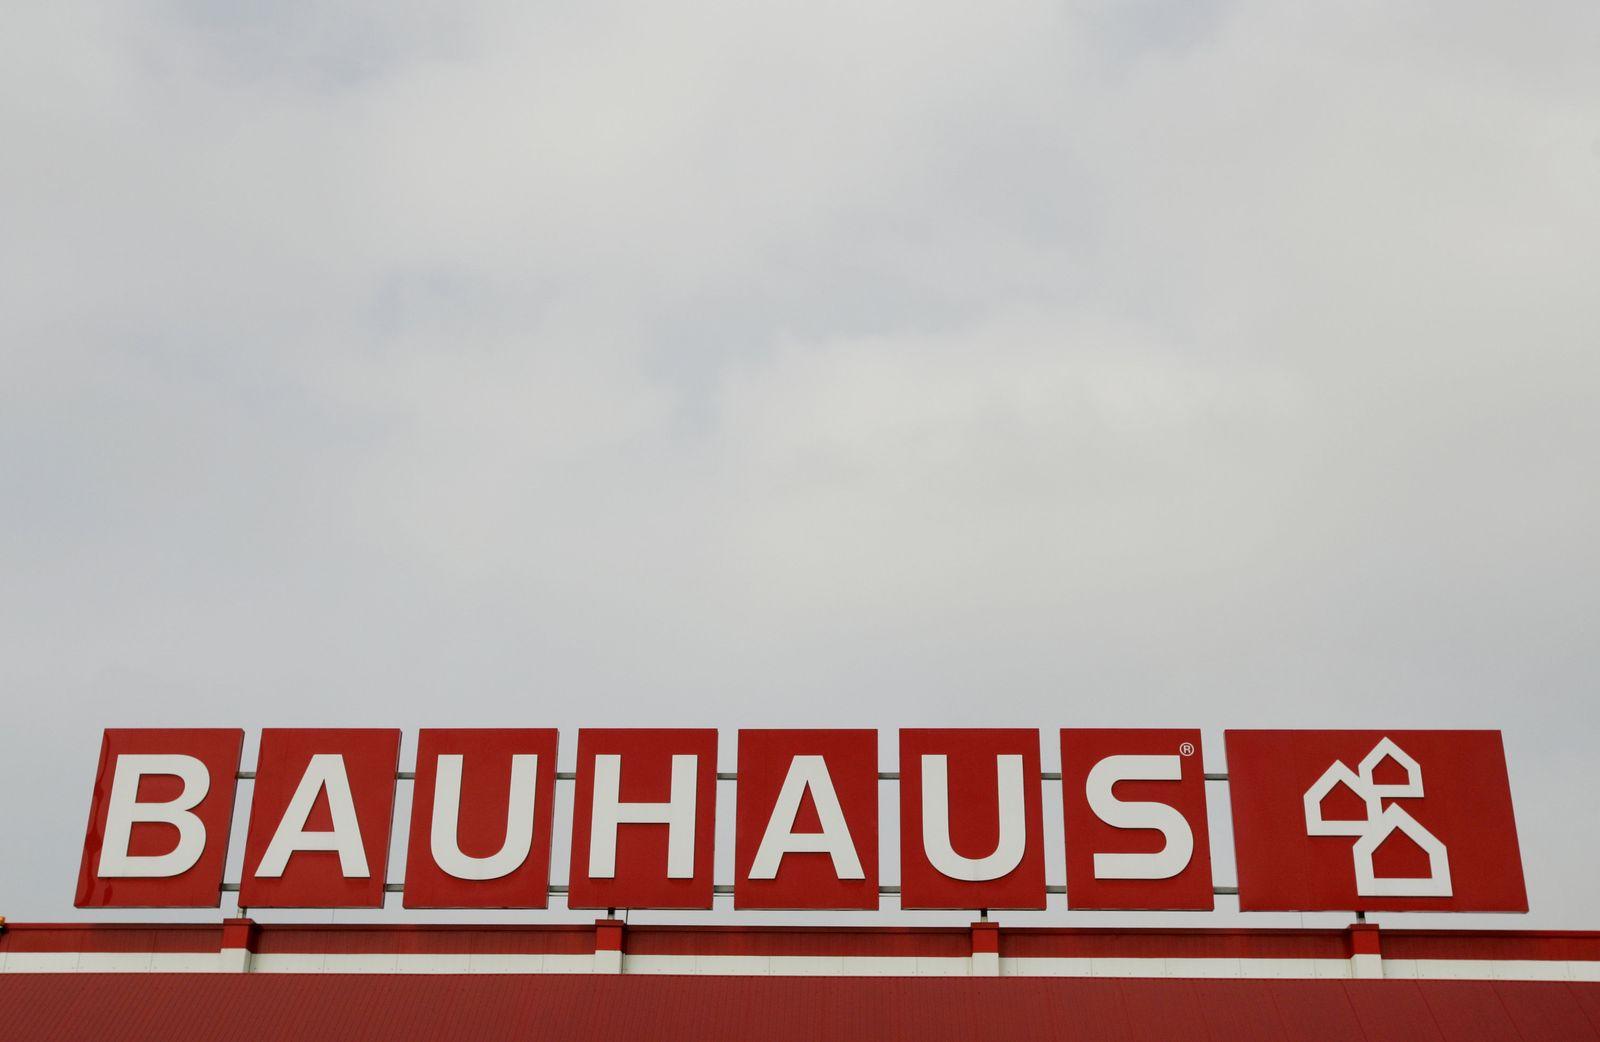 Baumarktkette Bauhaus